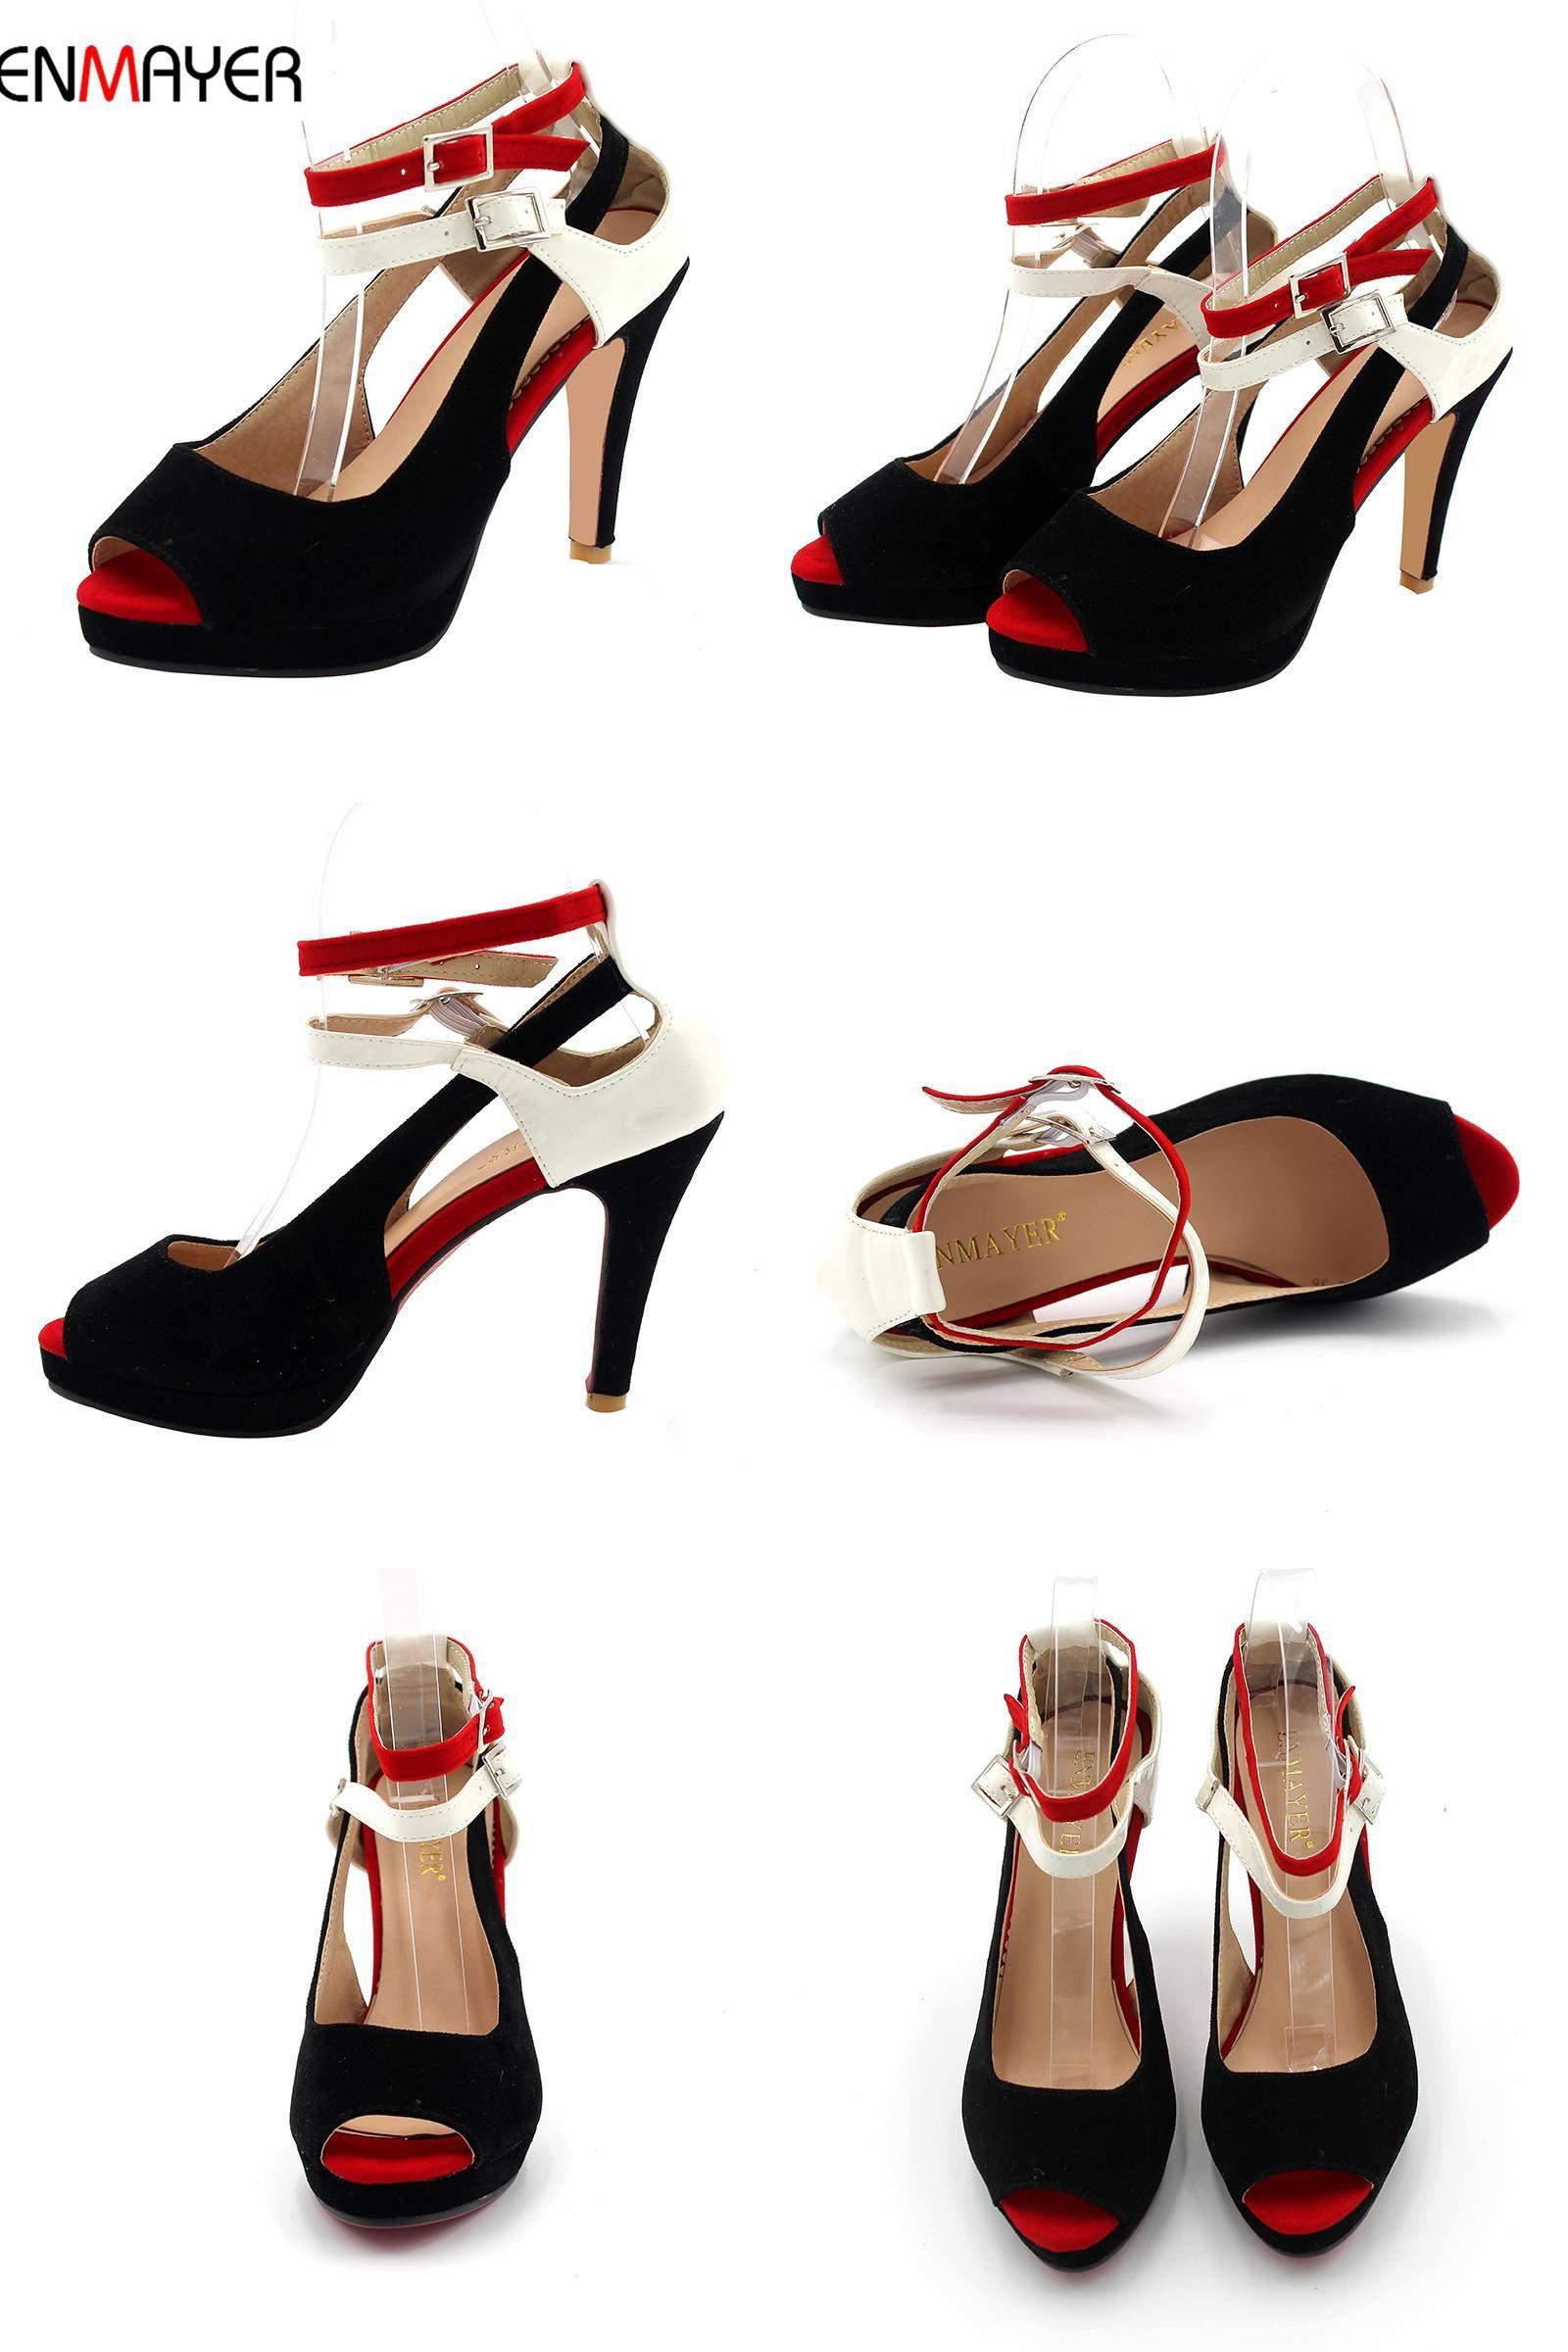 [Visit to Buy] ENMAYER Summer Big Size 2017 New  High Quality Fashion Women's Pumps Shoes Lady High Heels Ladies Pumps Woman Dress Shoes #Advertisement